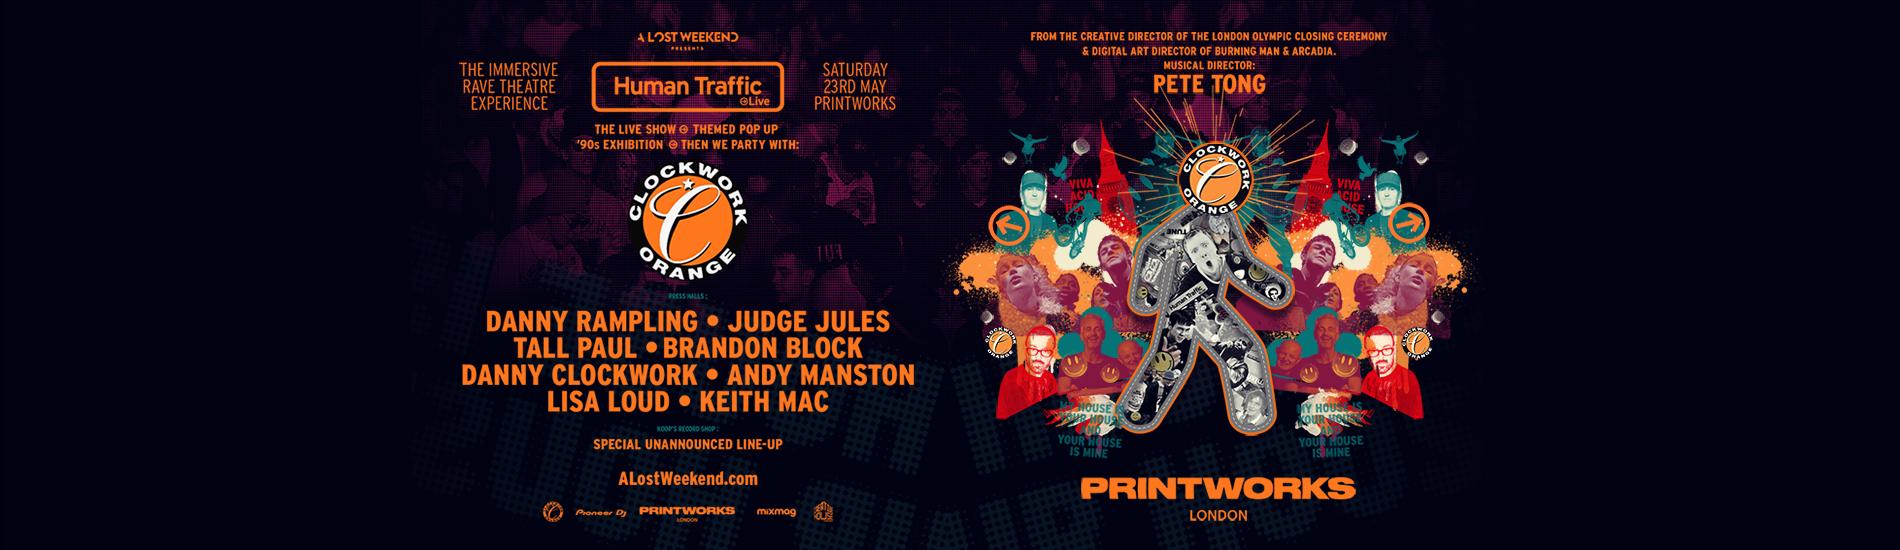 Human Traffic Live x Icons of Clockwork Orange